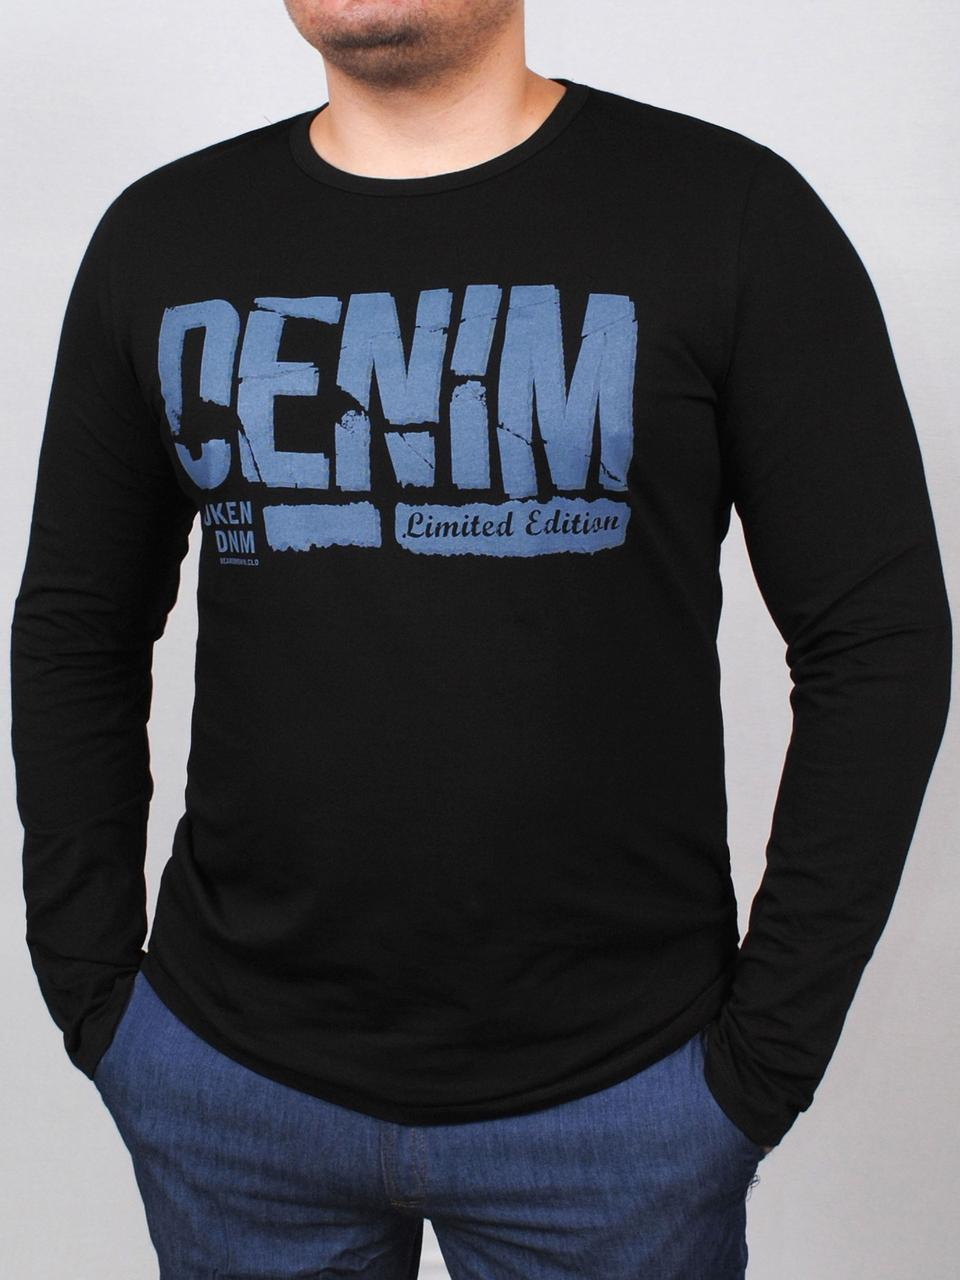 adbe1fdab9a70 DNM long футболка длинный рукав черный #R/A, цена 312,39 грн ...